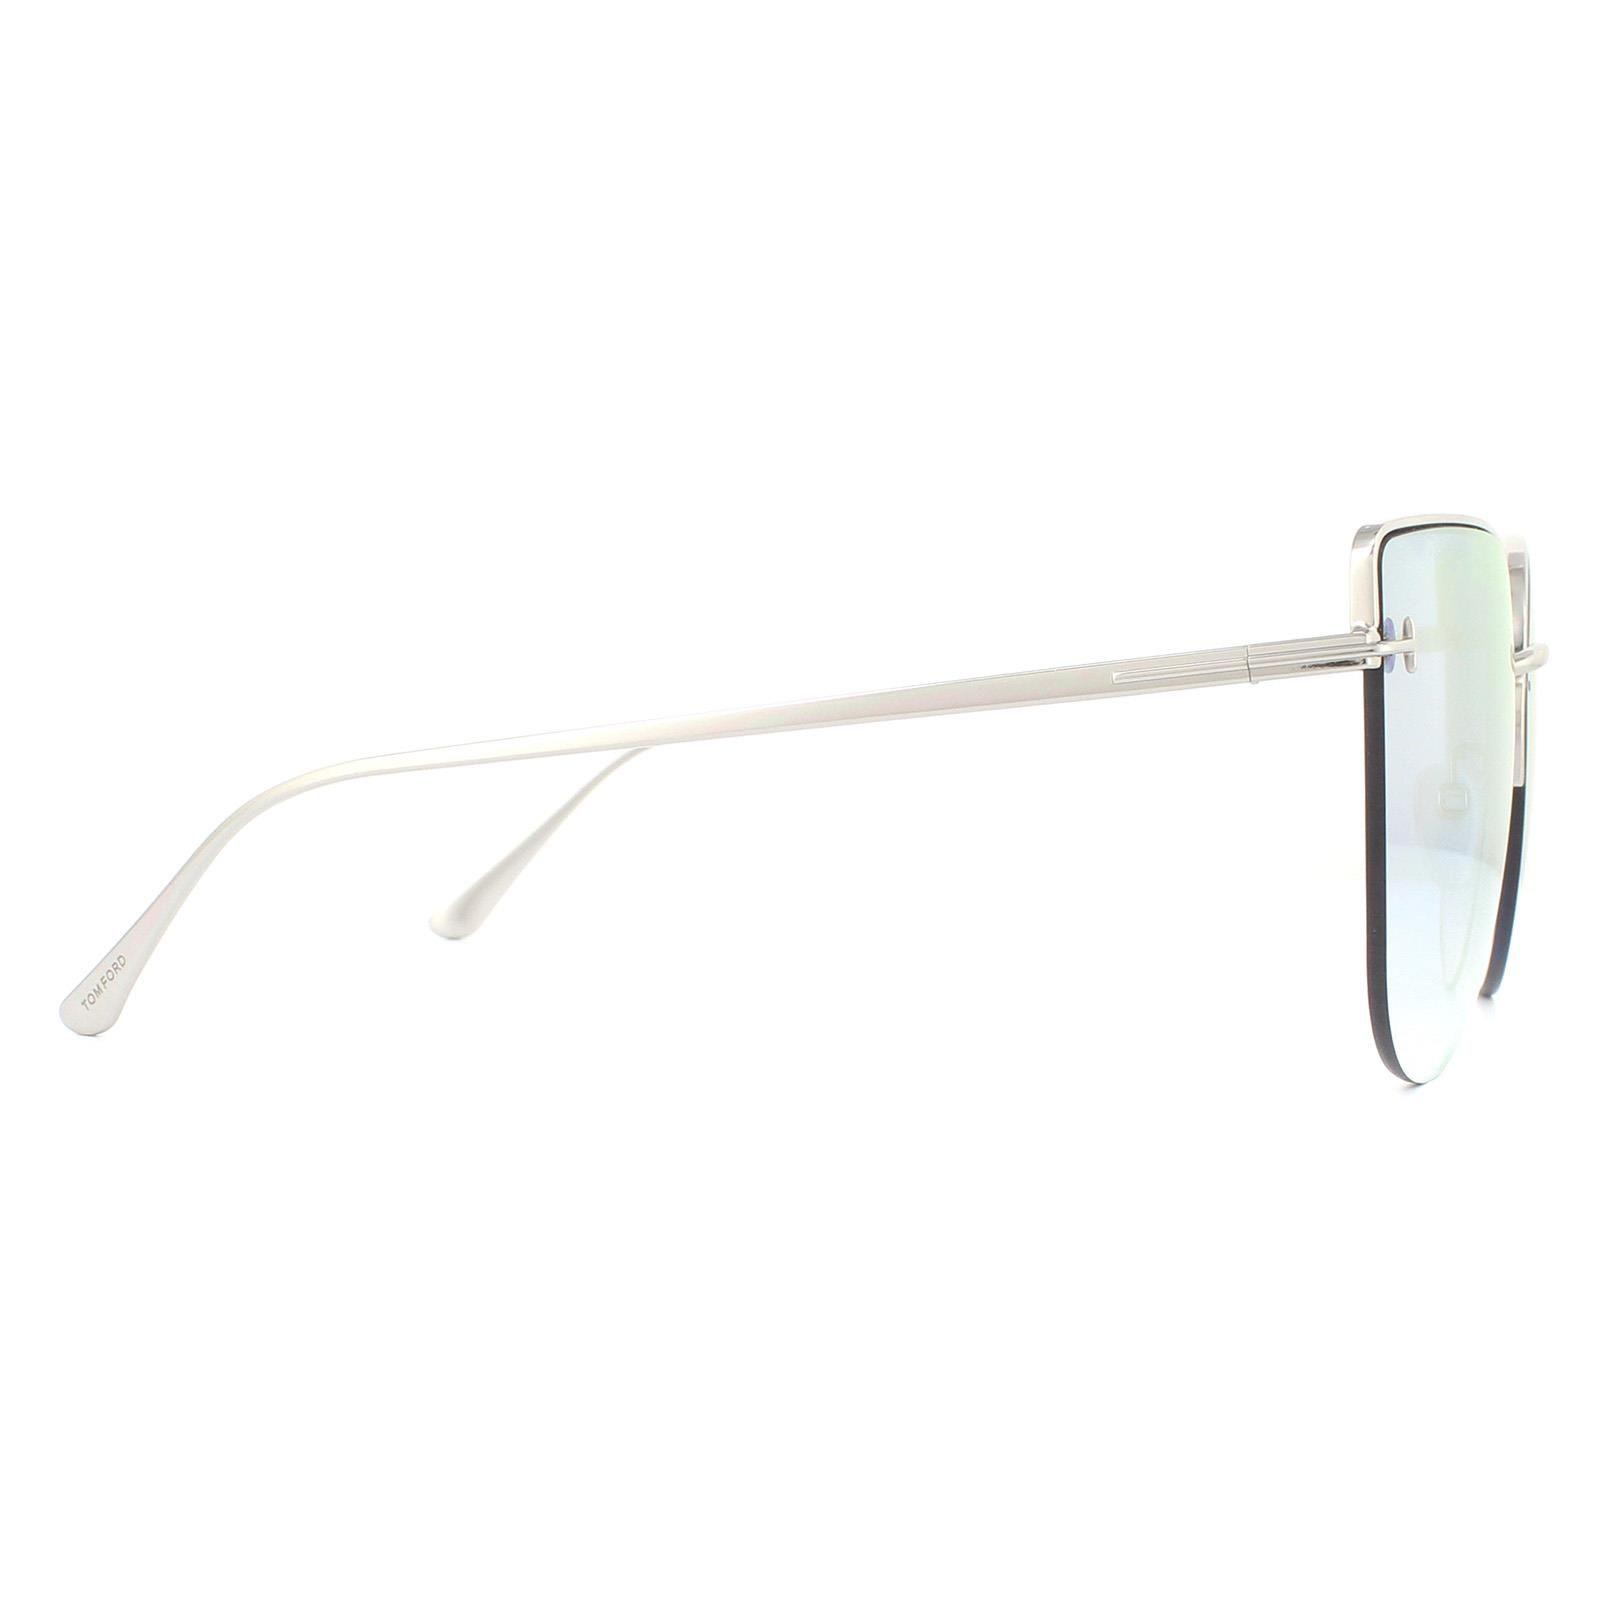 Tom Ford Sunglasses Ingrid-02 FT0652 16Z Shiny Palladium Blue Gradient